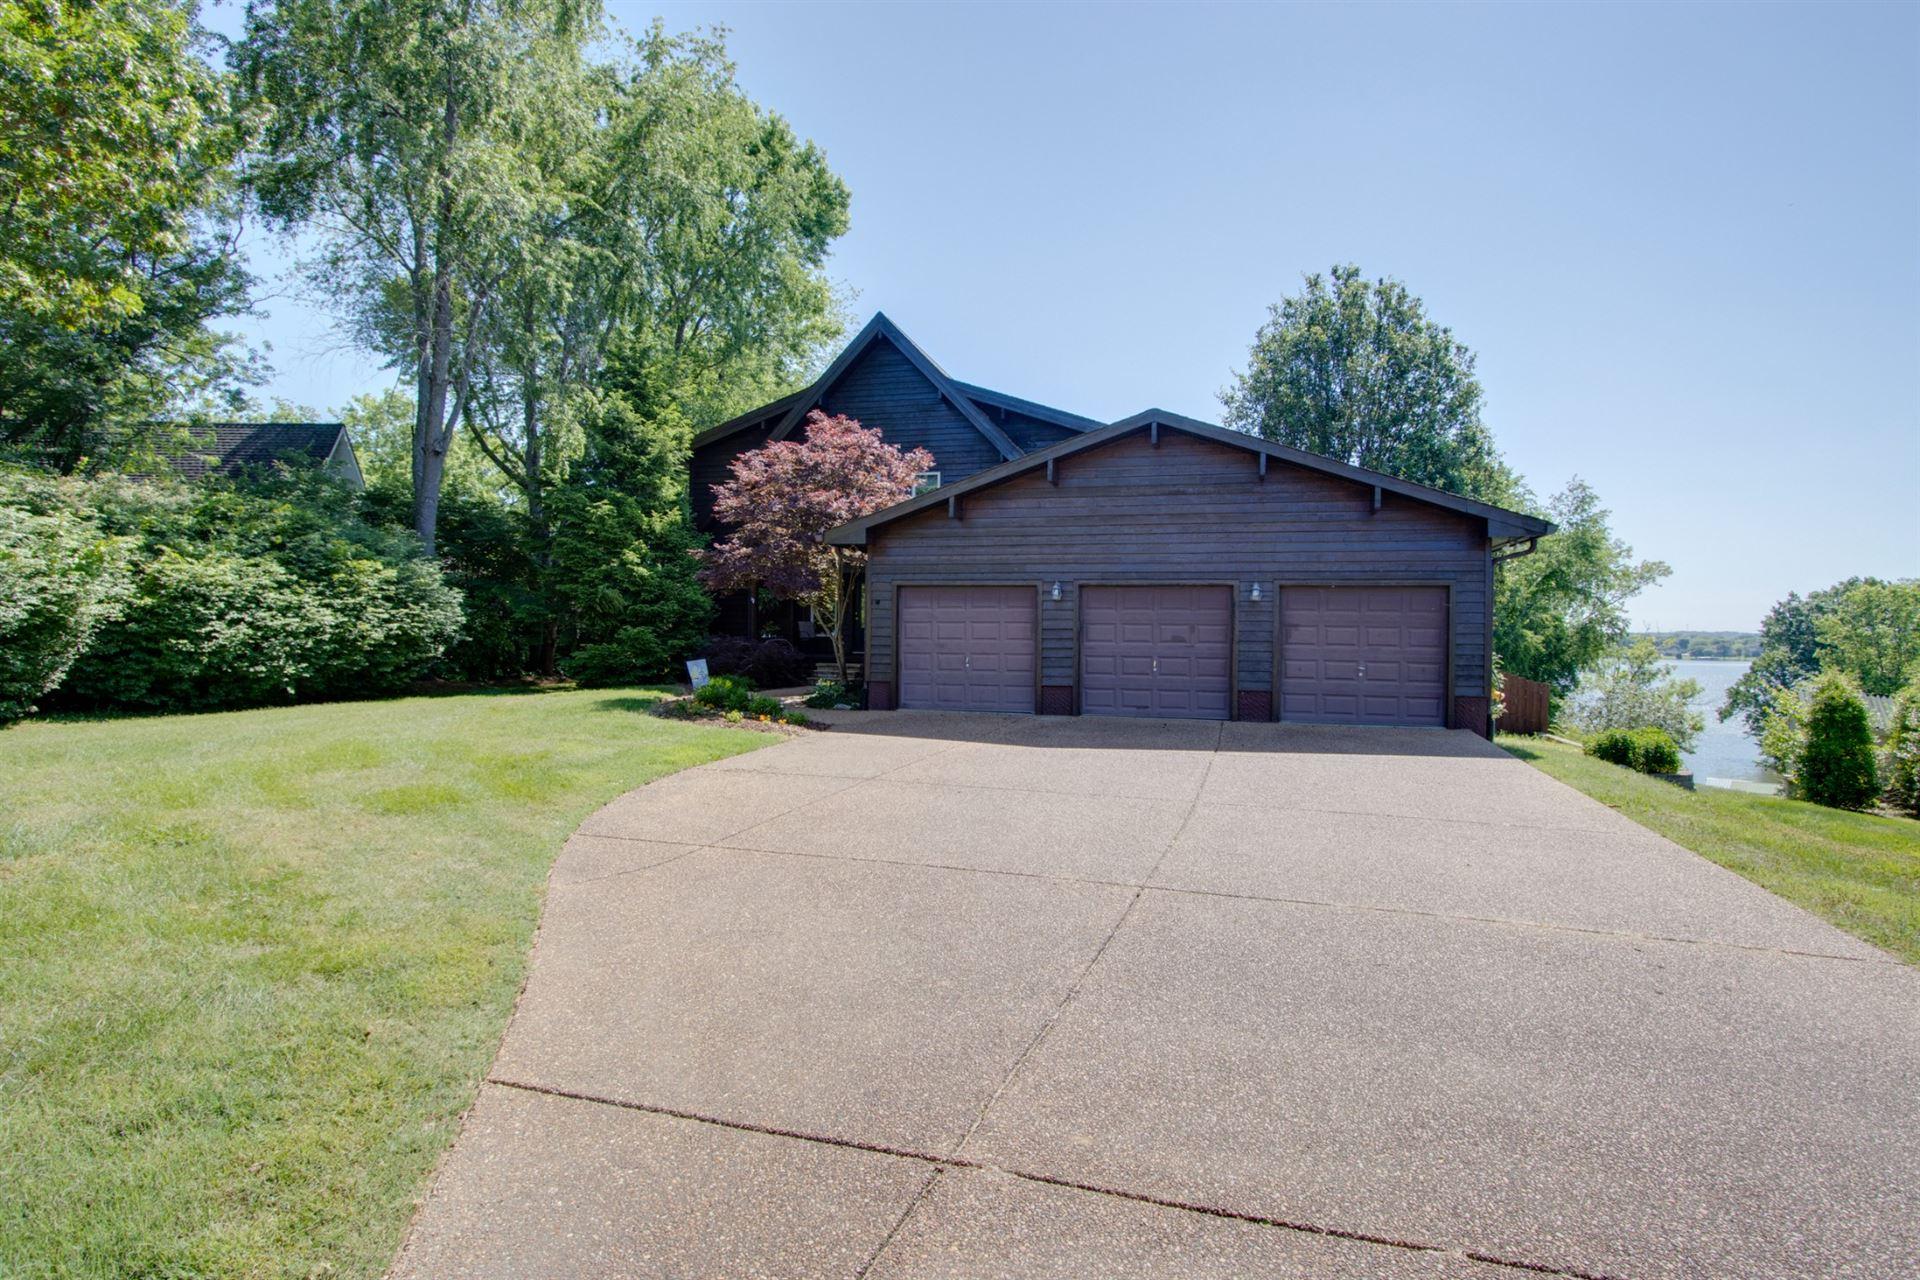 335 Lakeview Circle, Mount Juliet, TN 37122 - MLS#: 2254548